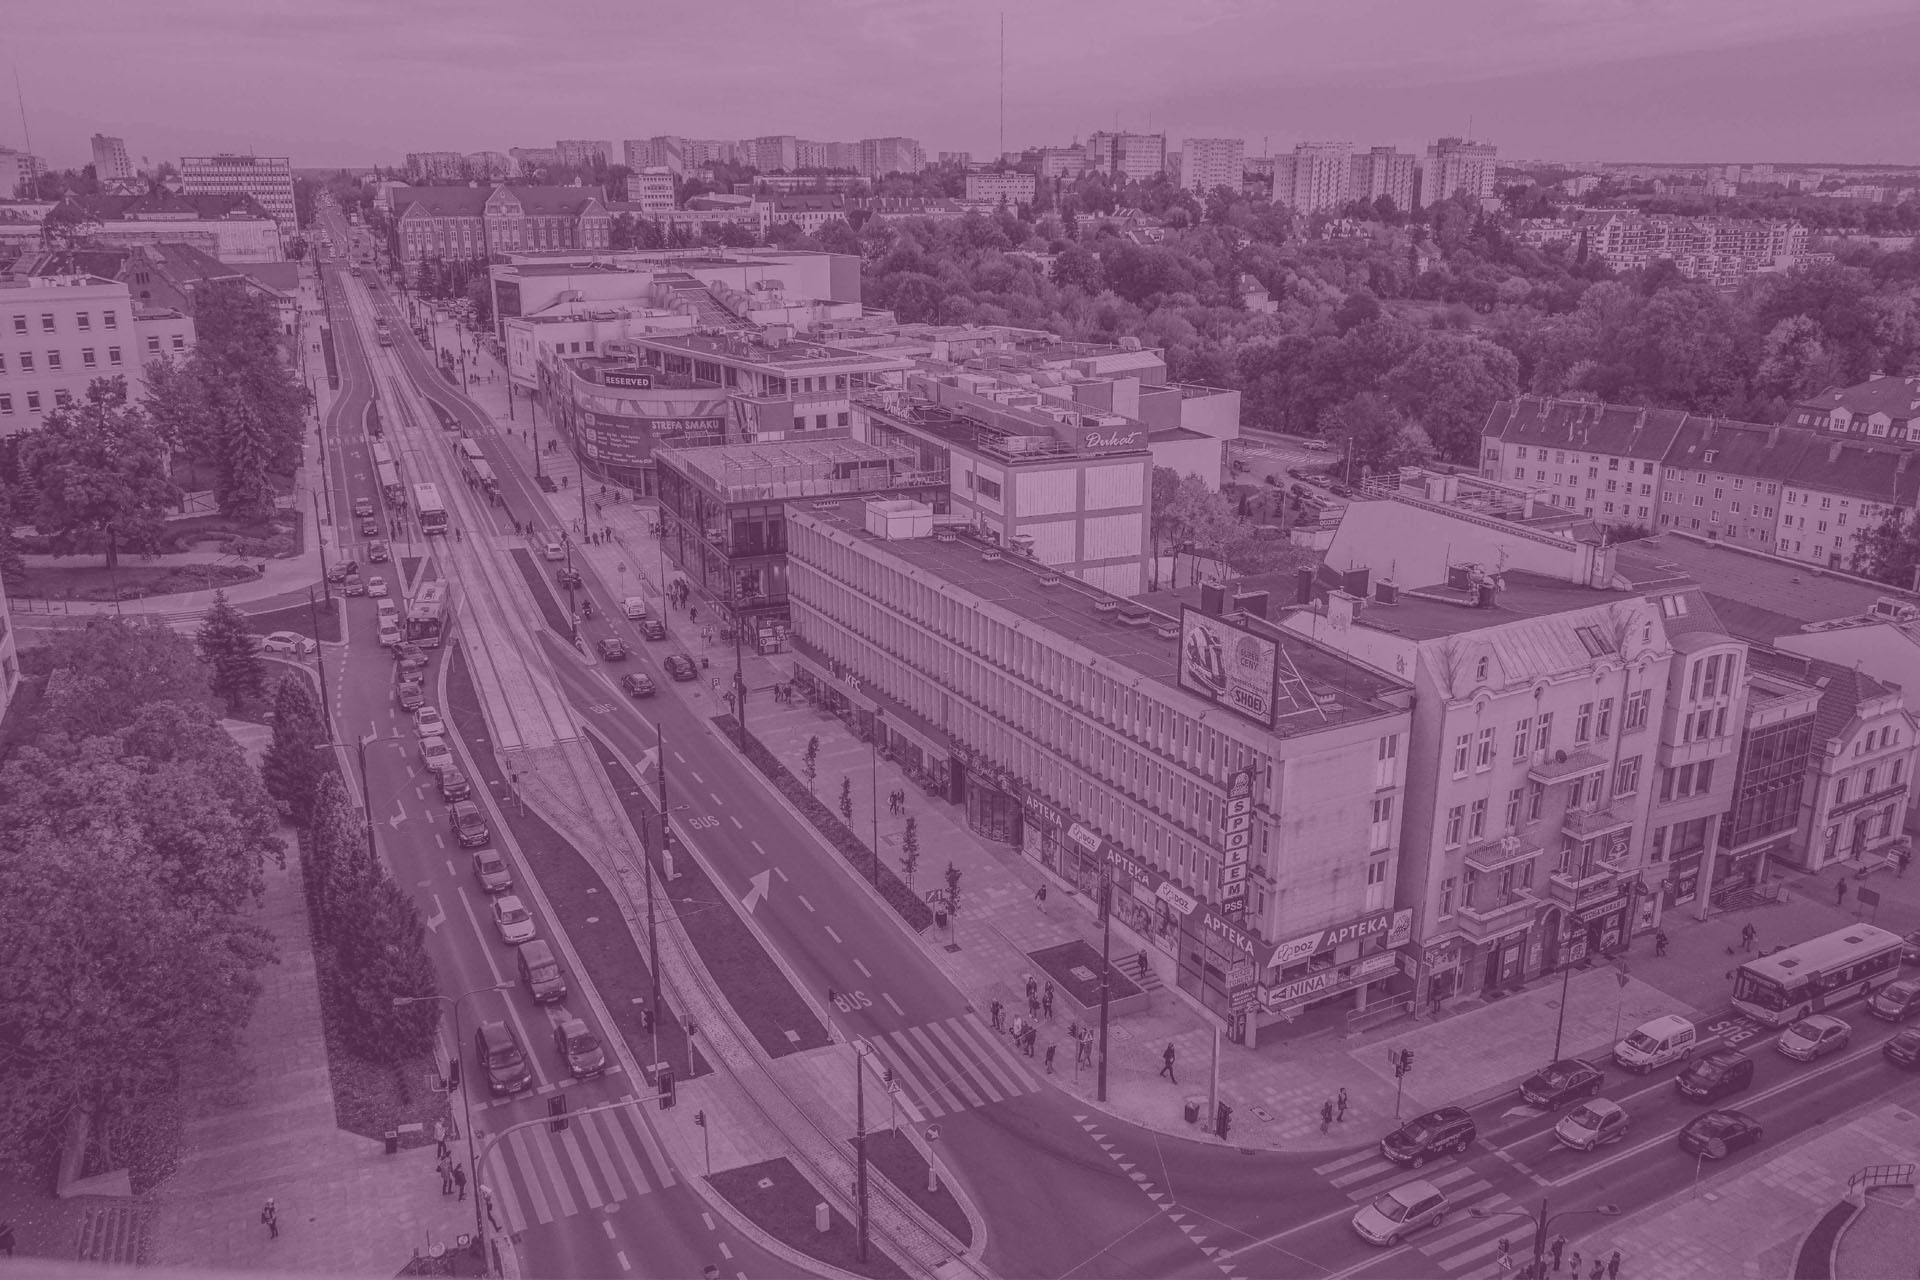 Olsztyn 2.0 - Dumni z Olsztyna